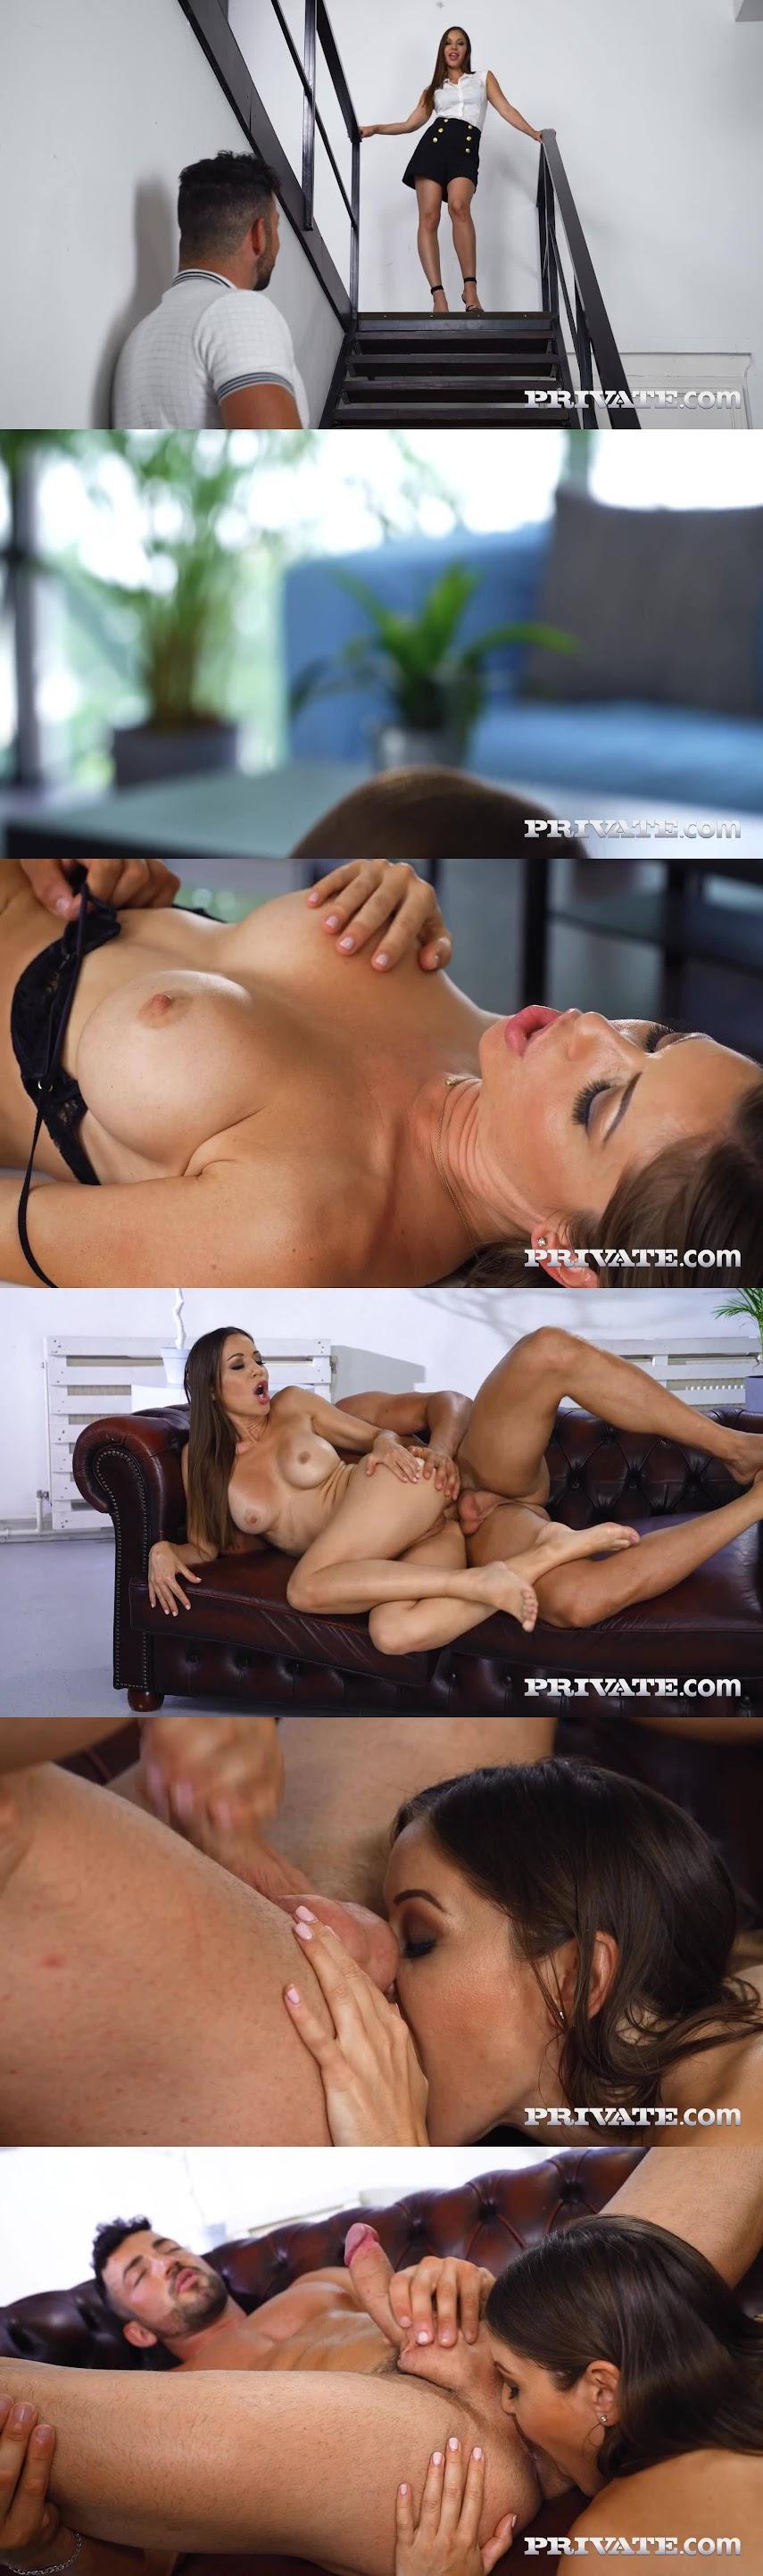 AV Angelica Heart - Angelica Heart MILF Addicted to Anal1080p sexy girls image jav